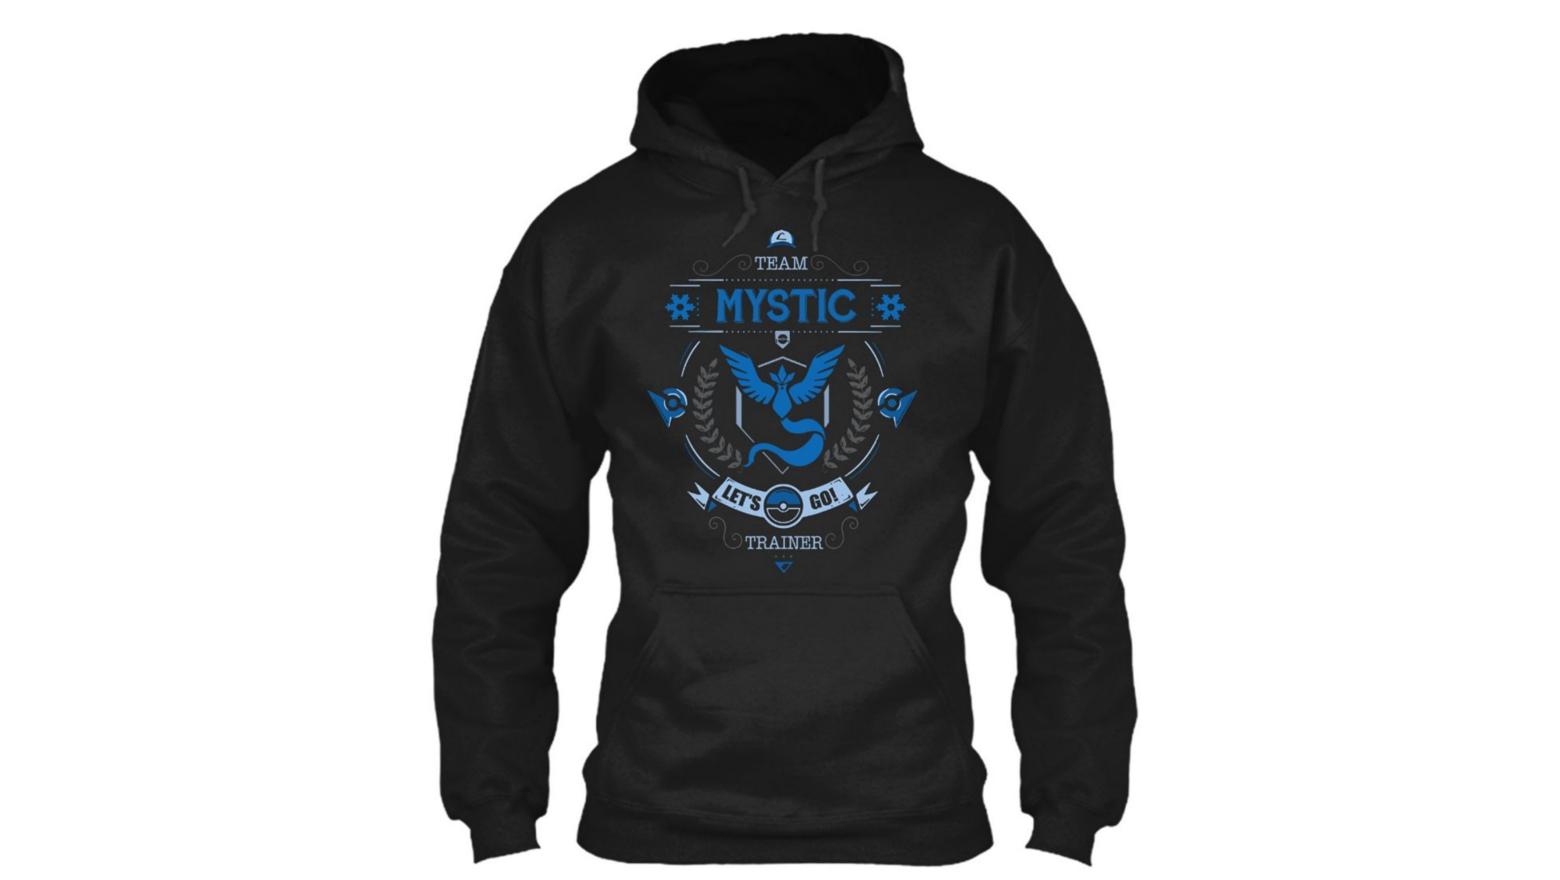 pokemon go, pokemon go team mystic, team mystic, team mystic hoodie, team mystic sweatshirt, team mystic merchandise, pokemon go merchandise, pokemon go teams, pokemon go guide